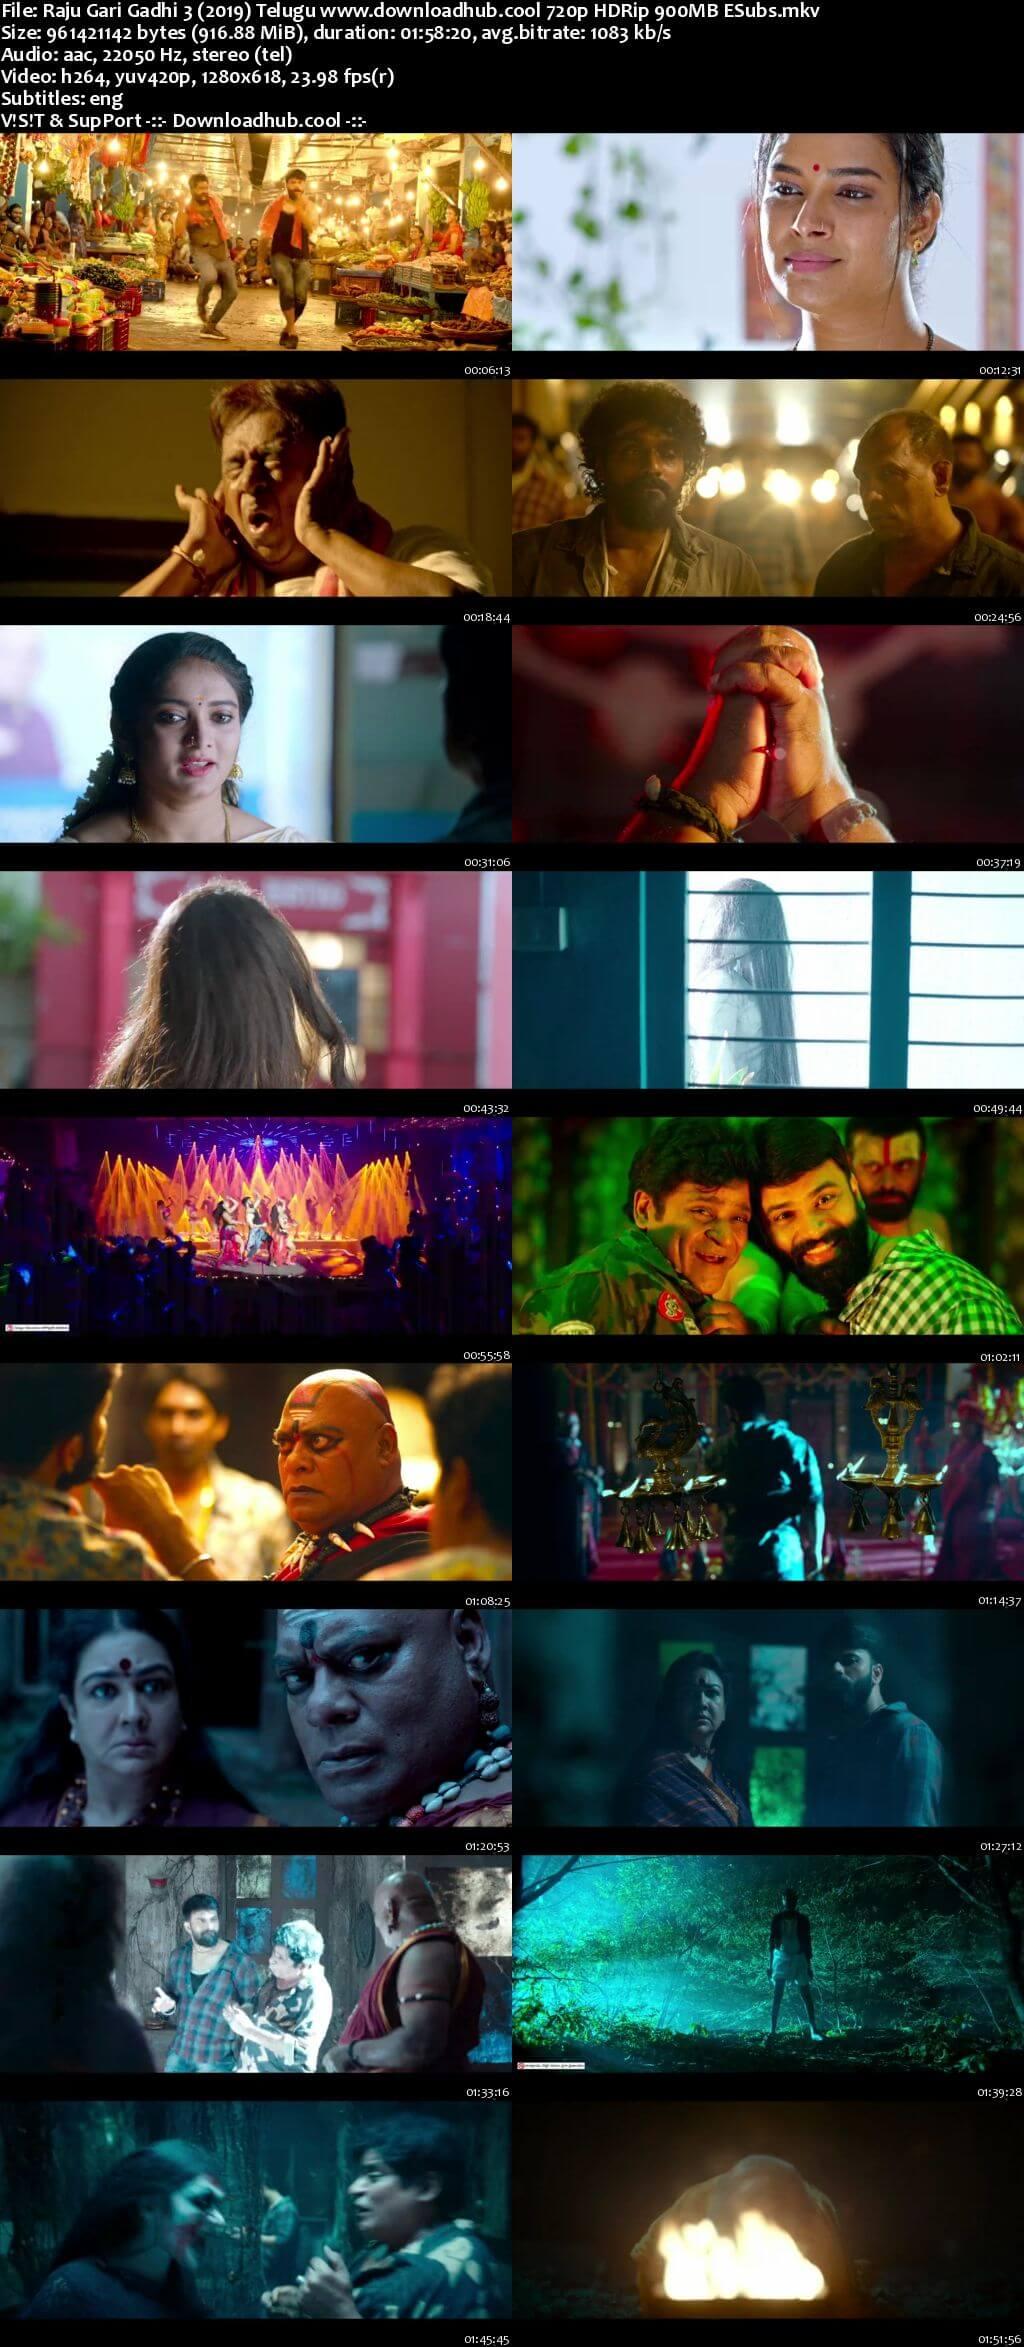 Raju Gari Gadhi 3 2019 Telugu 720p HDRip ESubs